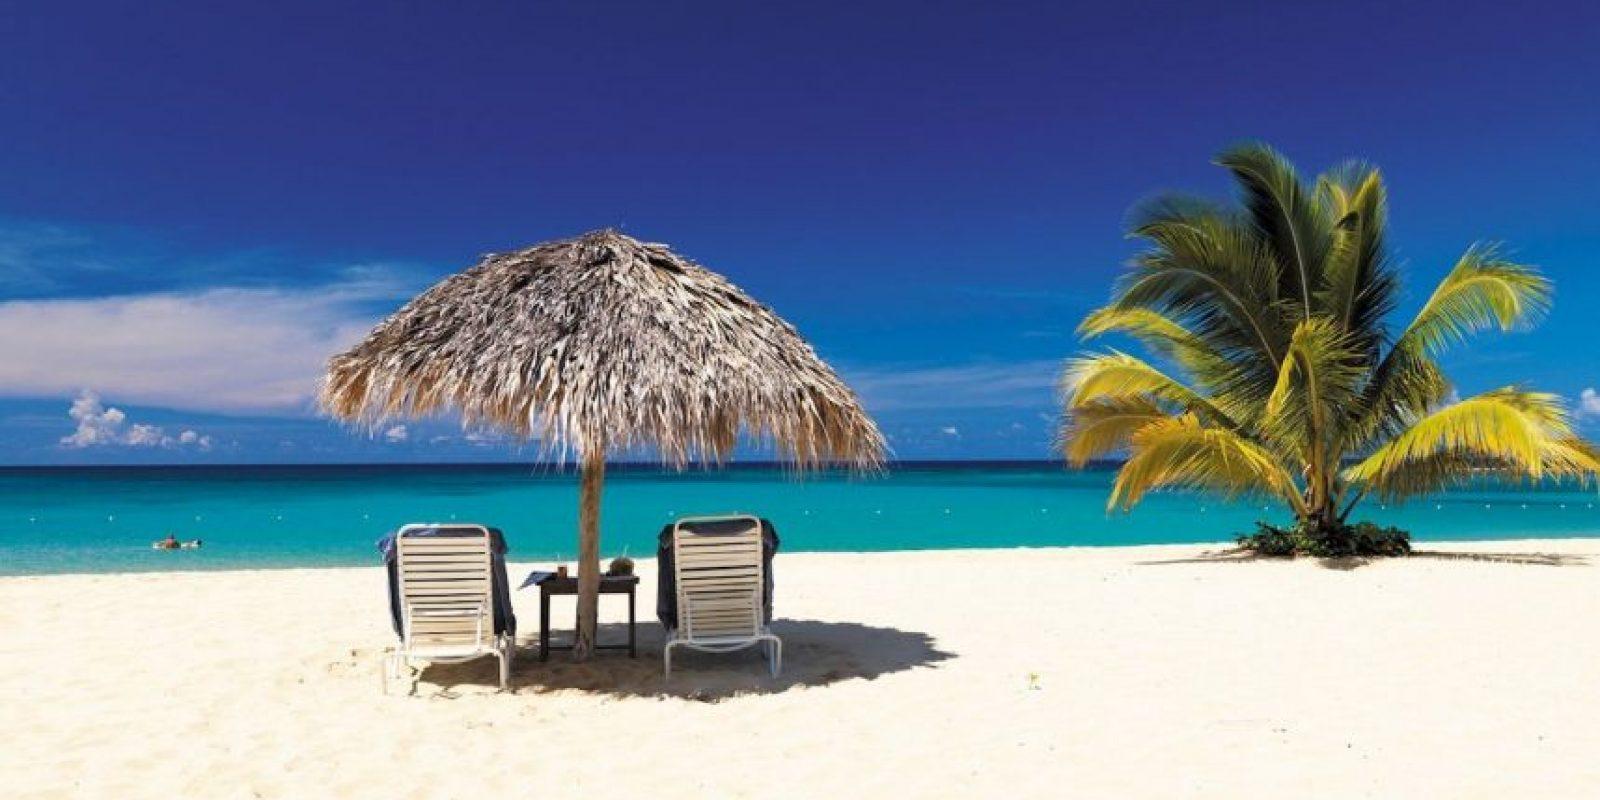 10. Jamaica Foto:Jamaicann